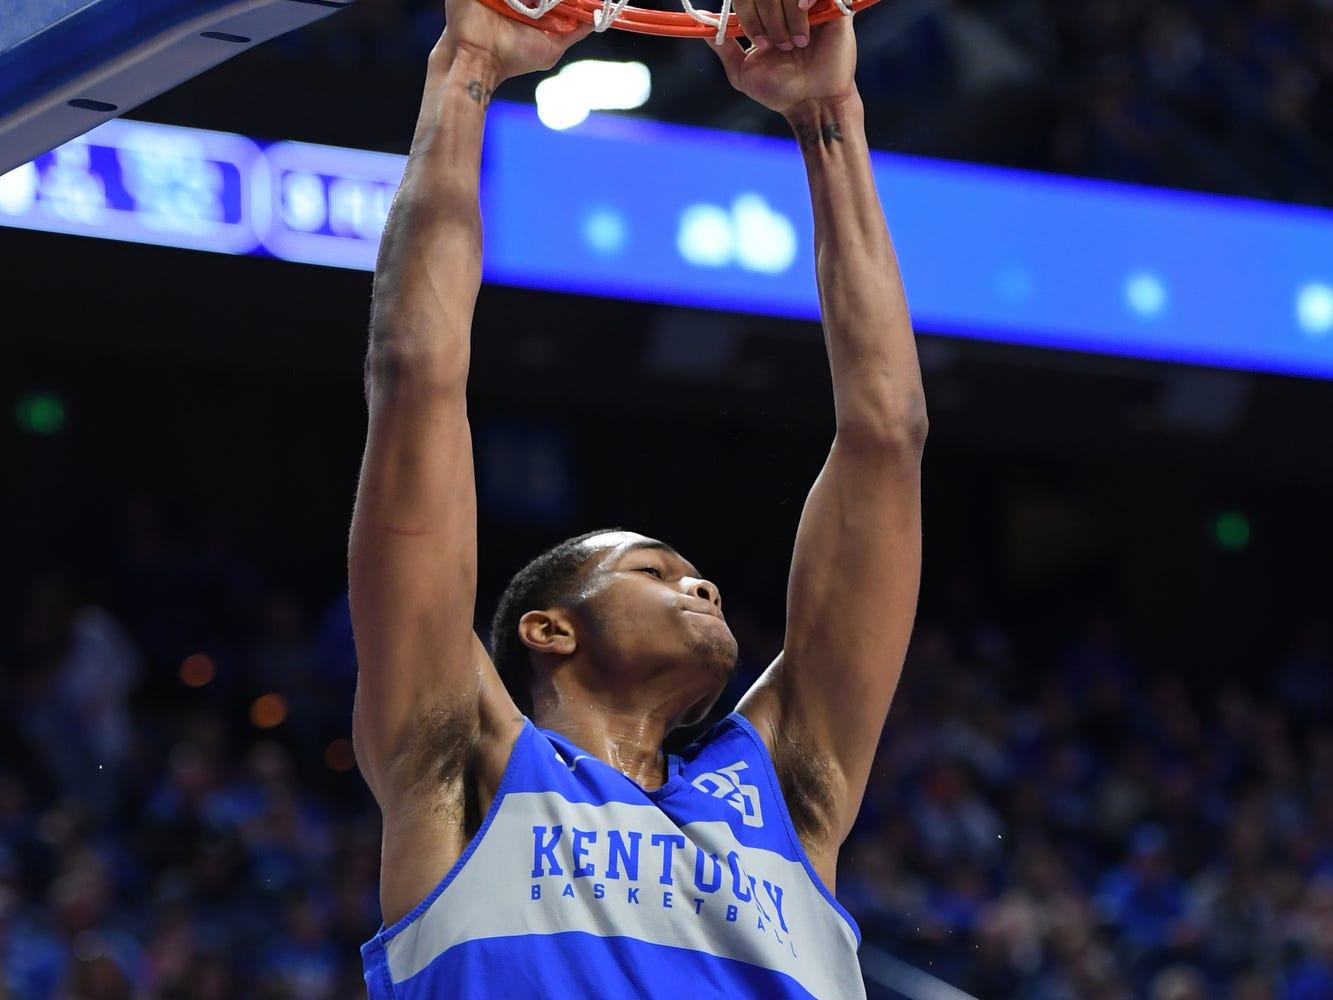 UK F PJ Washington dunks during the University of Kentucky mens basketball Blue/White game at Rupp Arena in Lexington, Kentucky on Sunday, October 21, 2018.